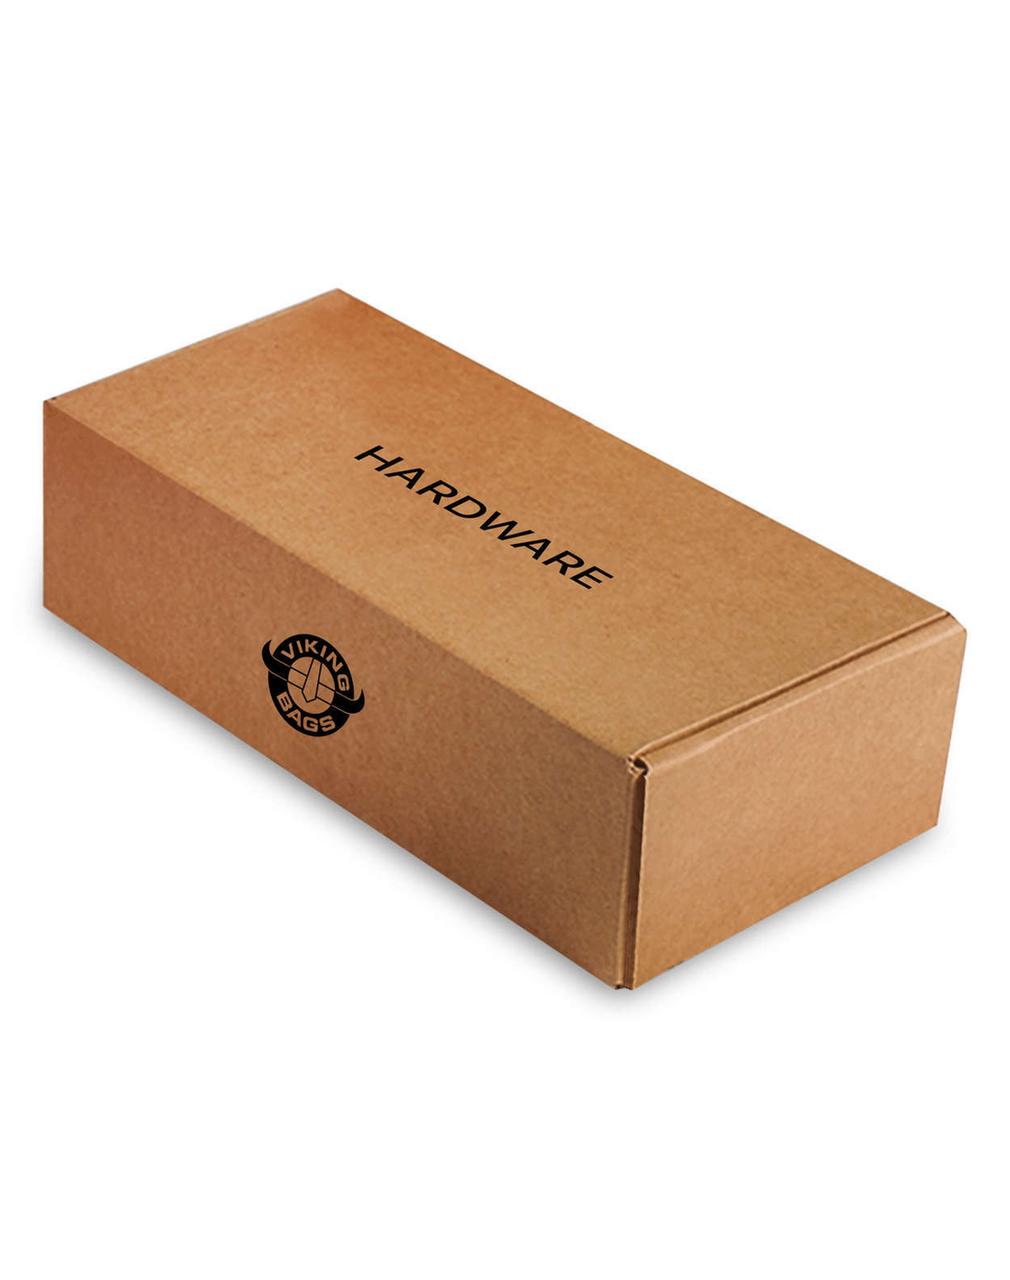 Honda 1500 Valkyrie Interstate SS Side Pocket Motorcycle Saddlebags Hardware Box